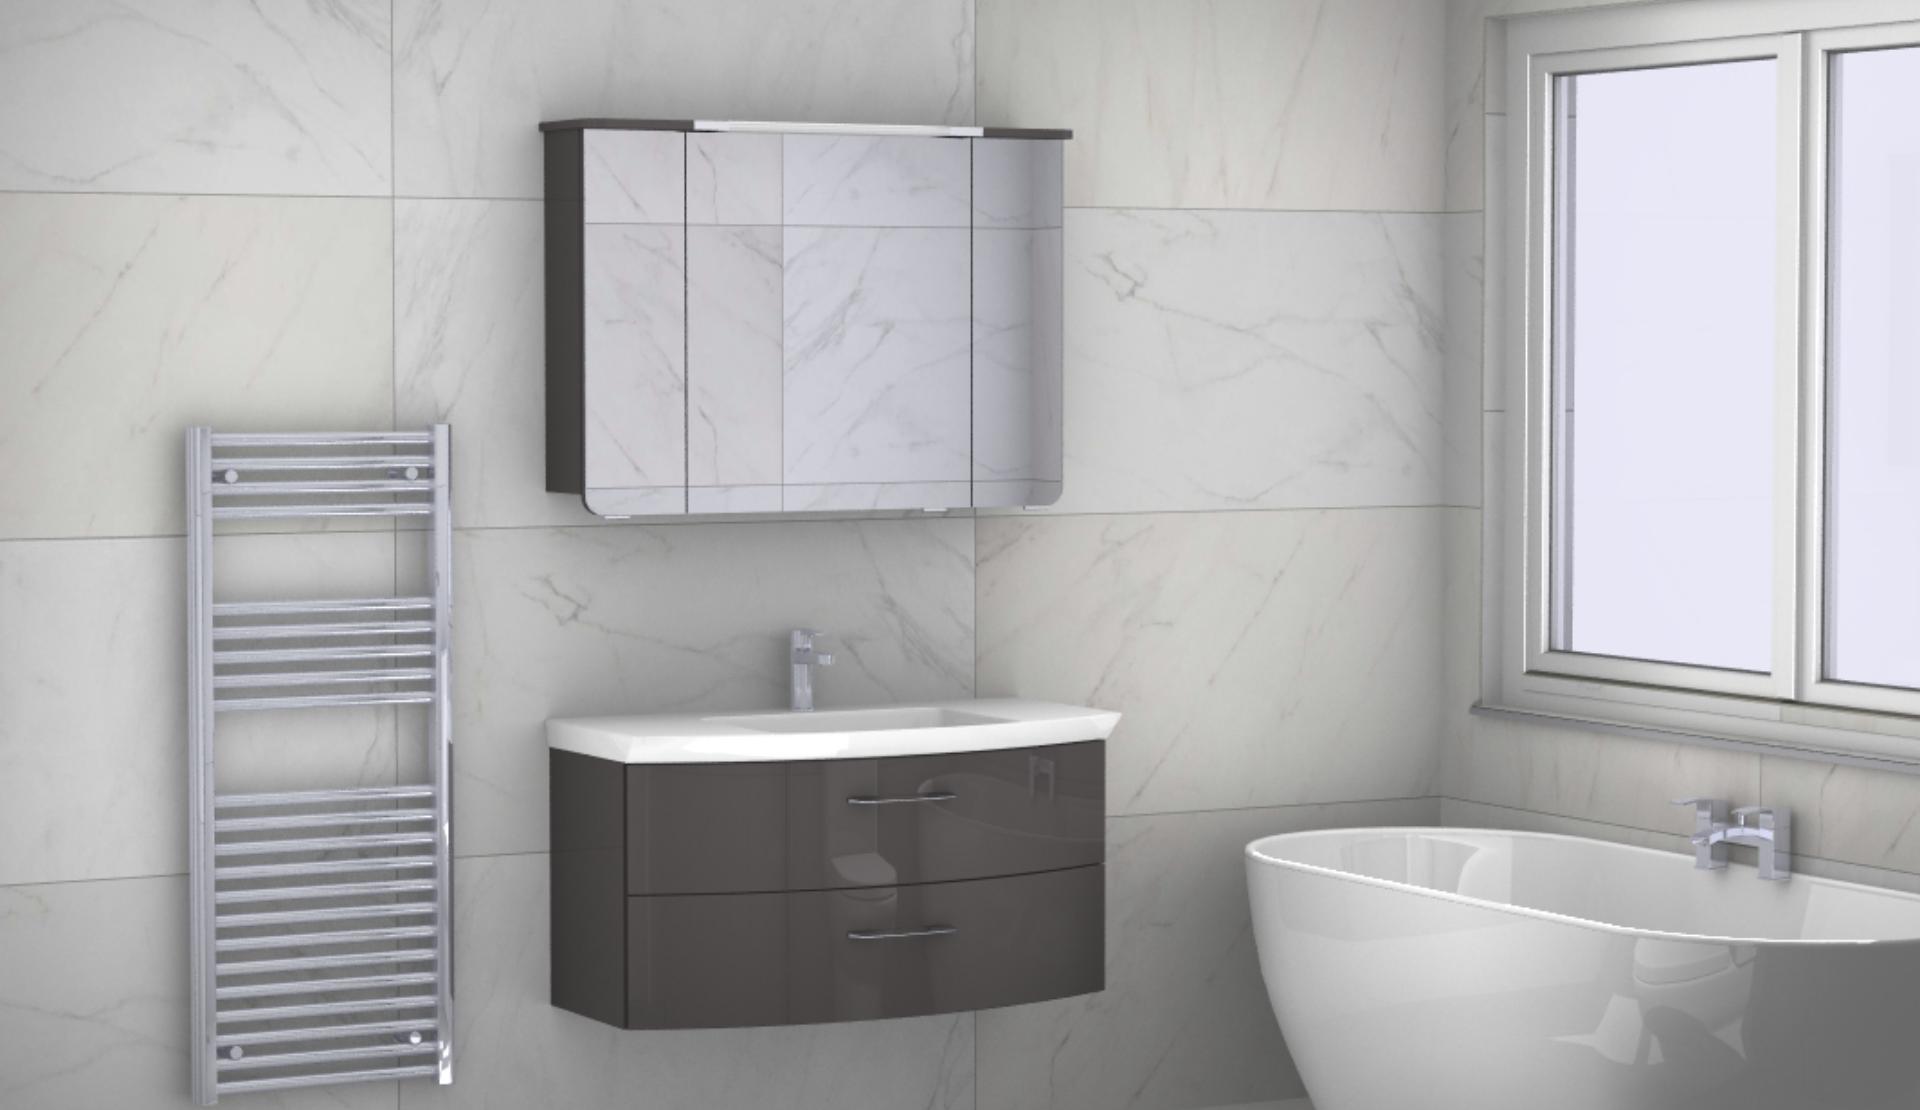 B3D Bathroom Design, hrooms Belfast Bathrooms Newry (2) Bathrooms Dundalk